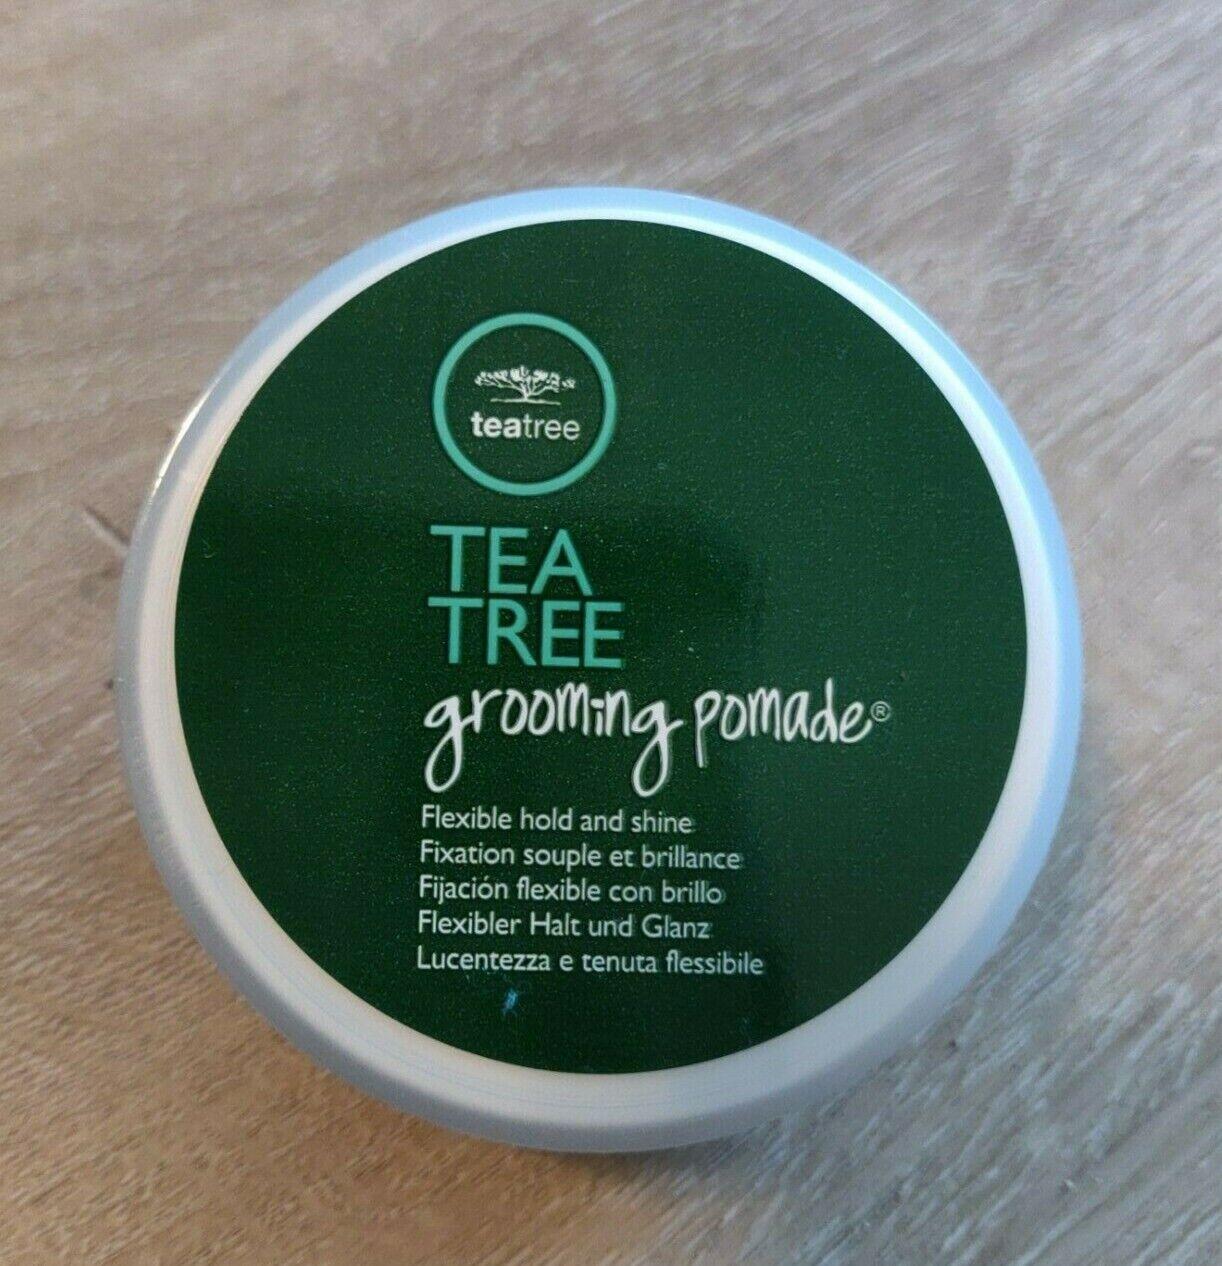 Paul Mitchell Tea Tree Grooming Pomade Flexible Hold & Shine